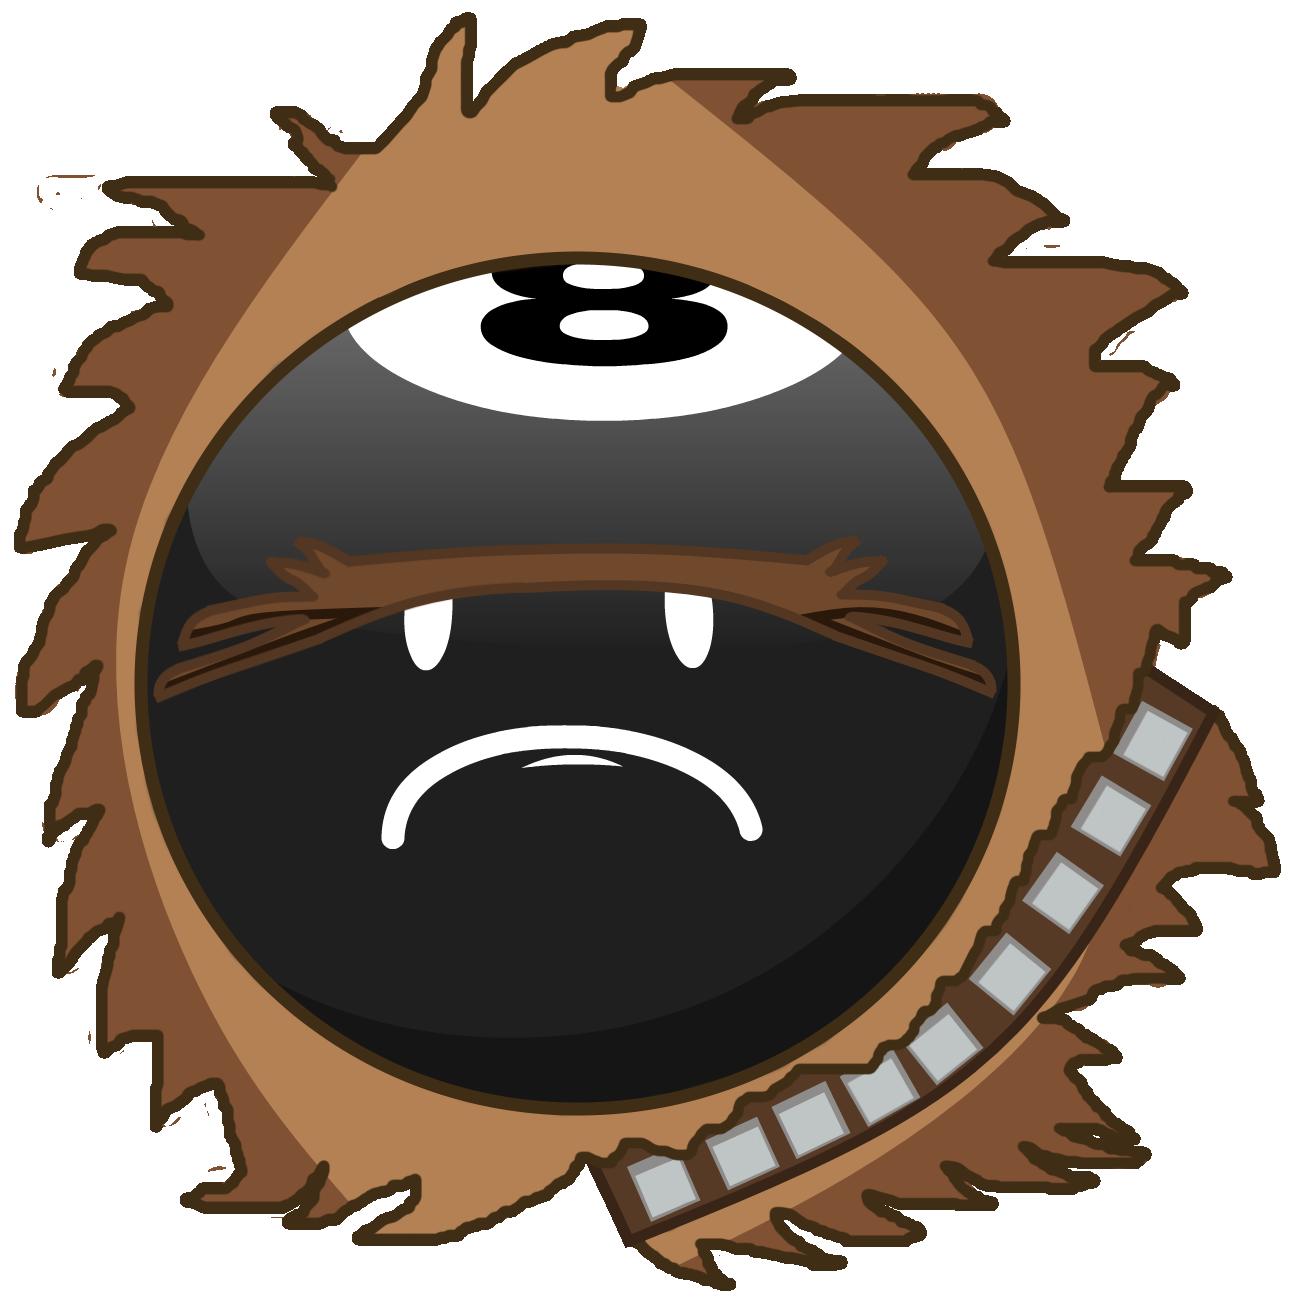 Chewbacca wiki